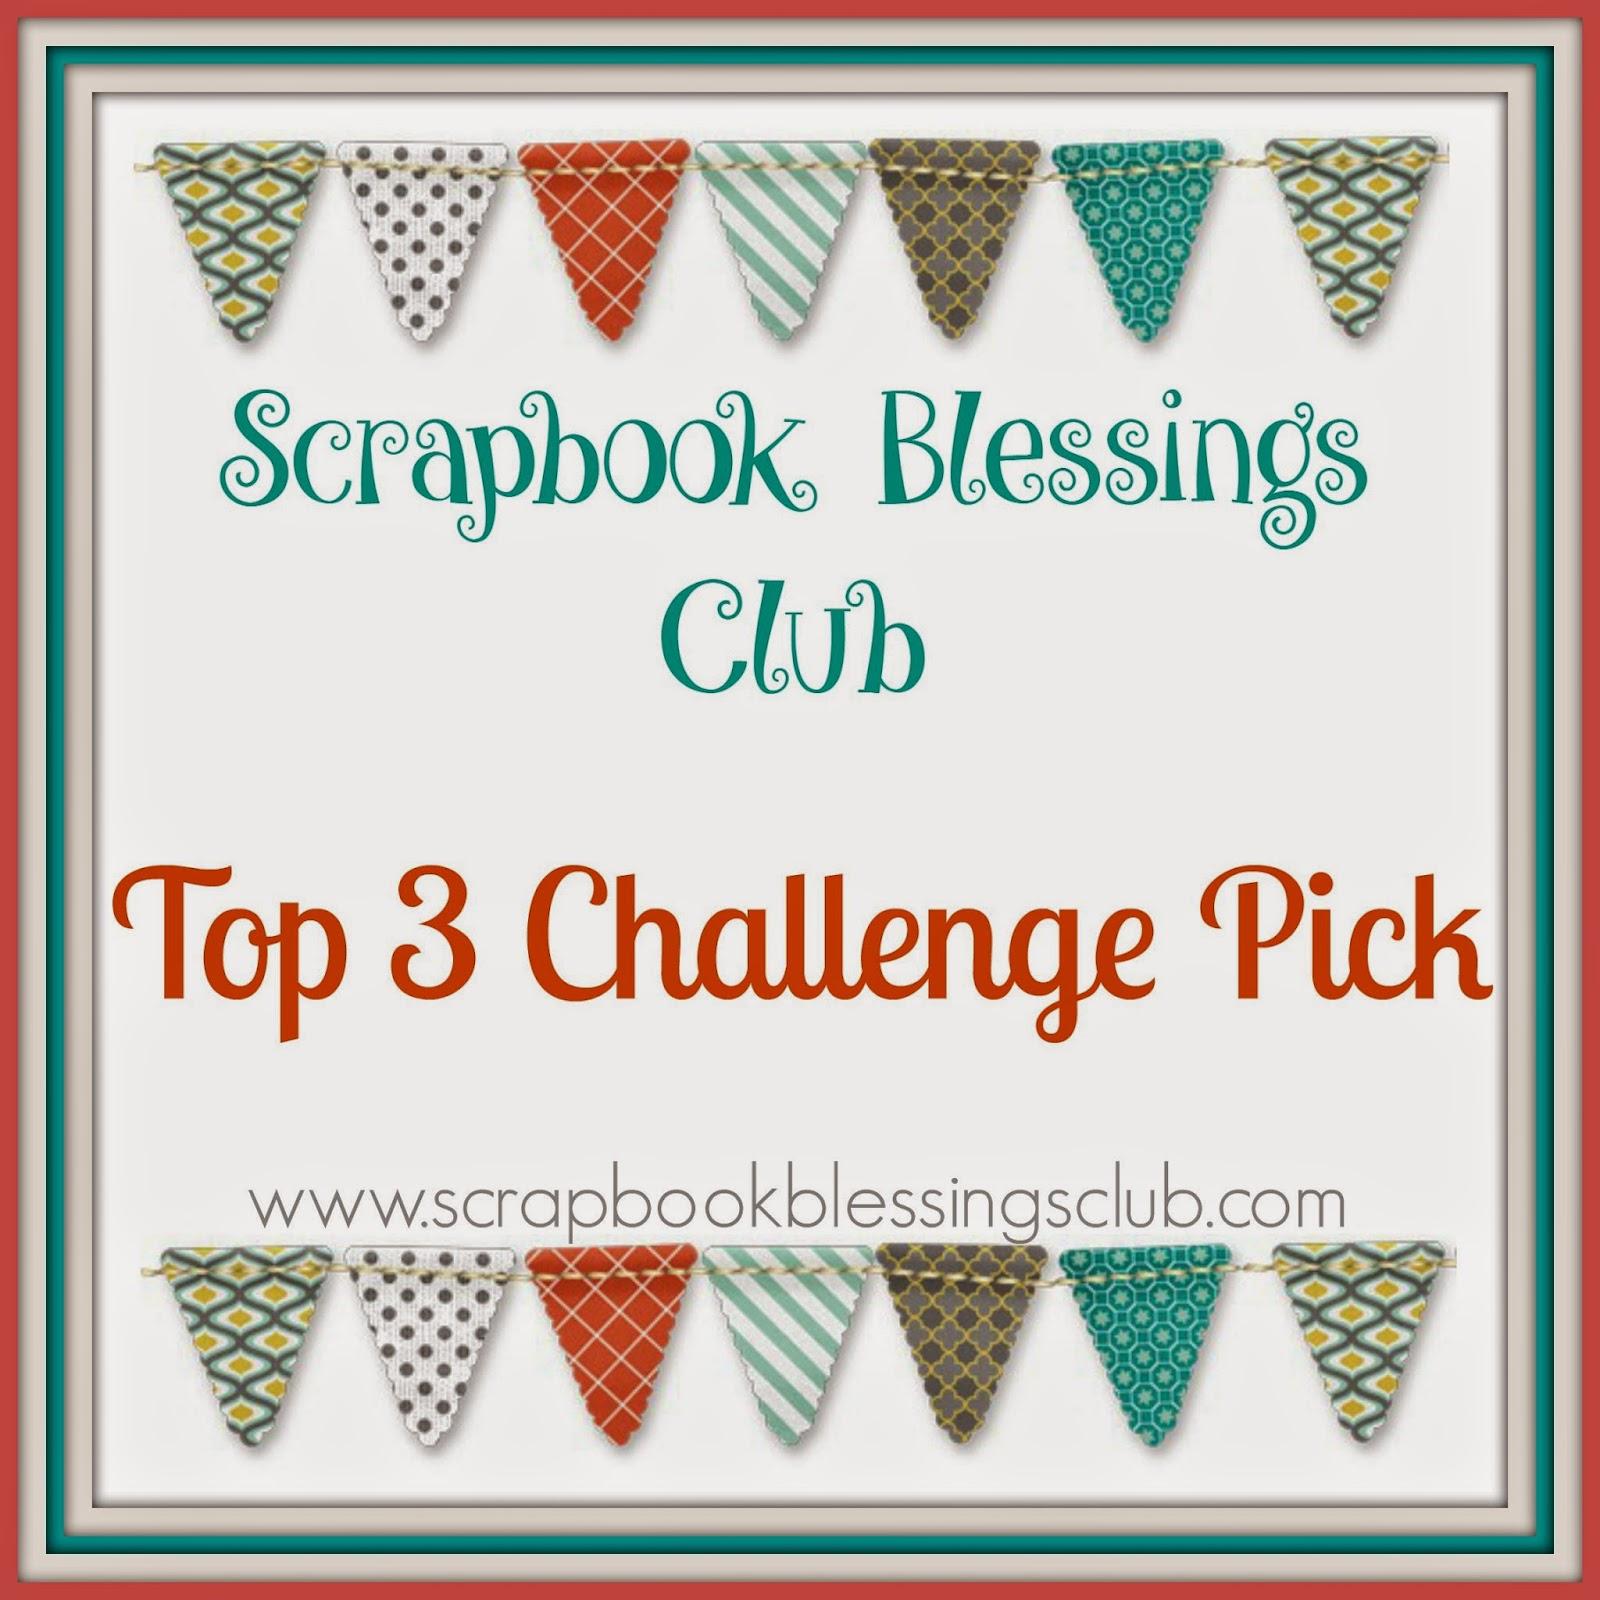 Top 10 Scrapbook Blessings Club